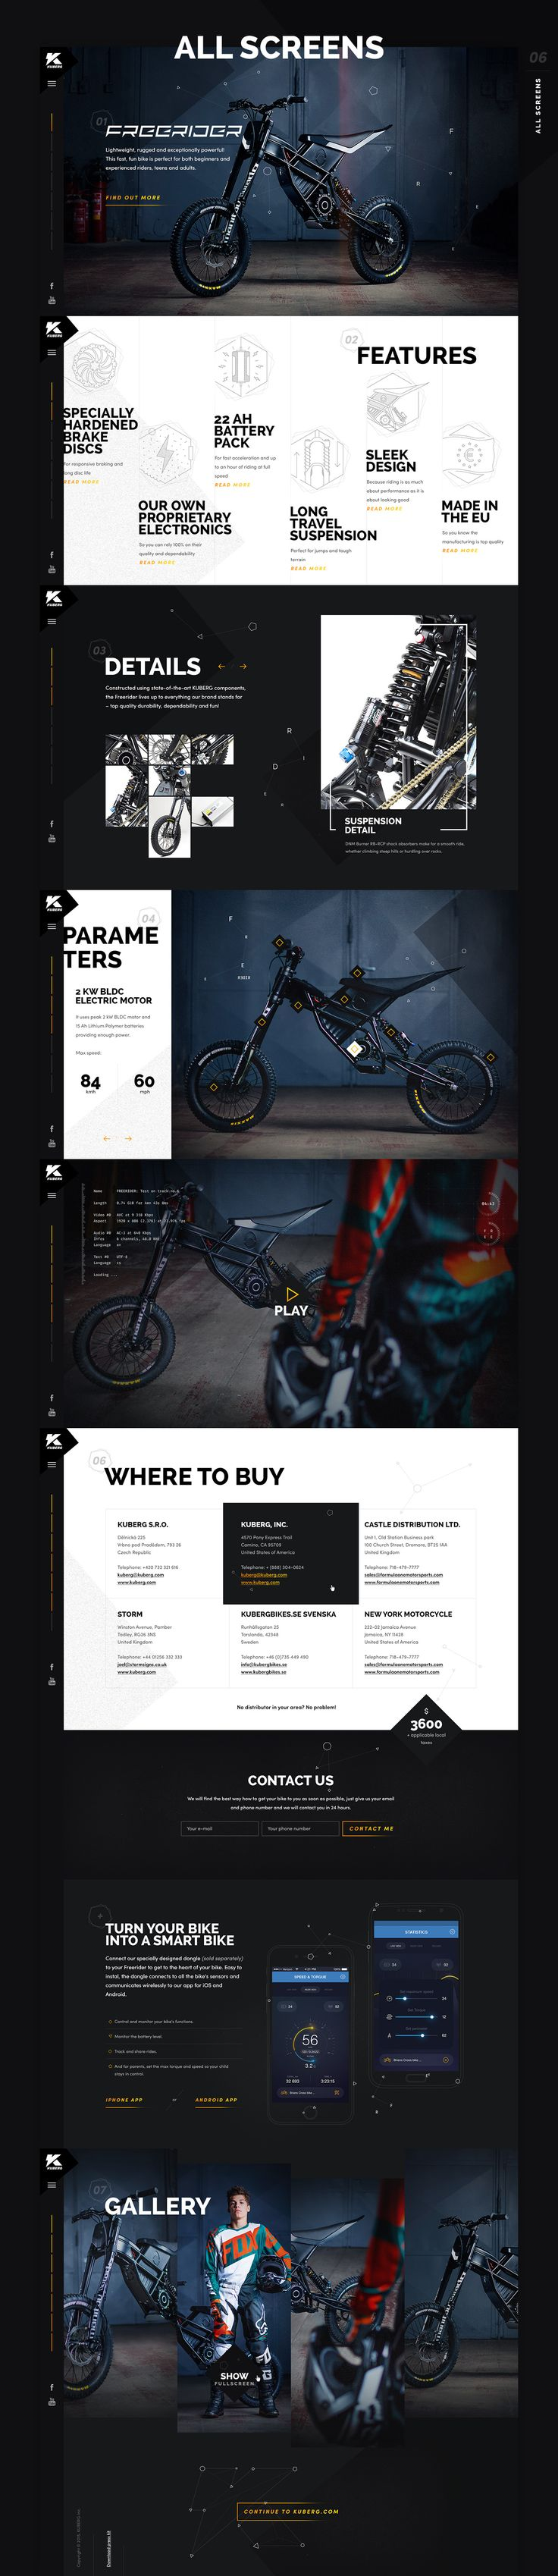 Kuberg – Free Rider website on Behance